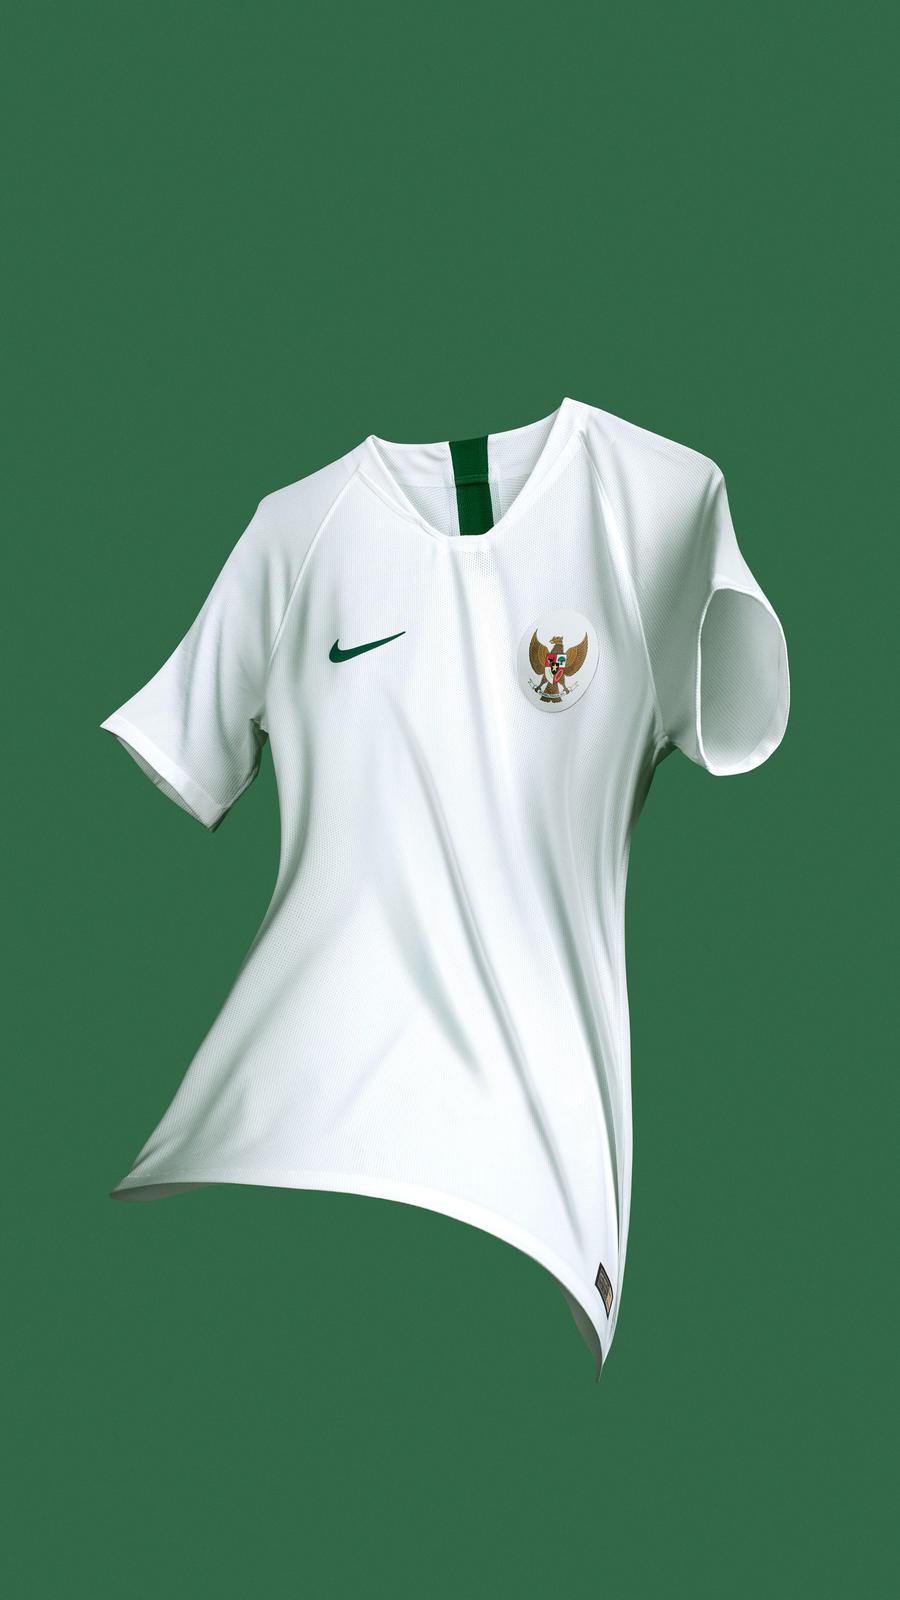 Kit Dls Garuda Select : garuda, select, Jersey, Garuda, Indonesia, Kekinian, Online